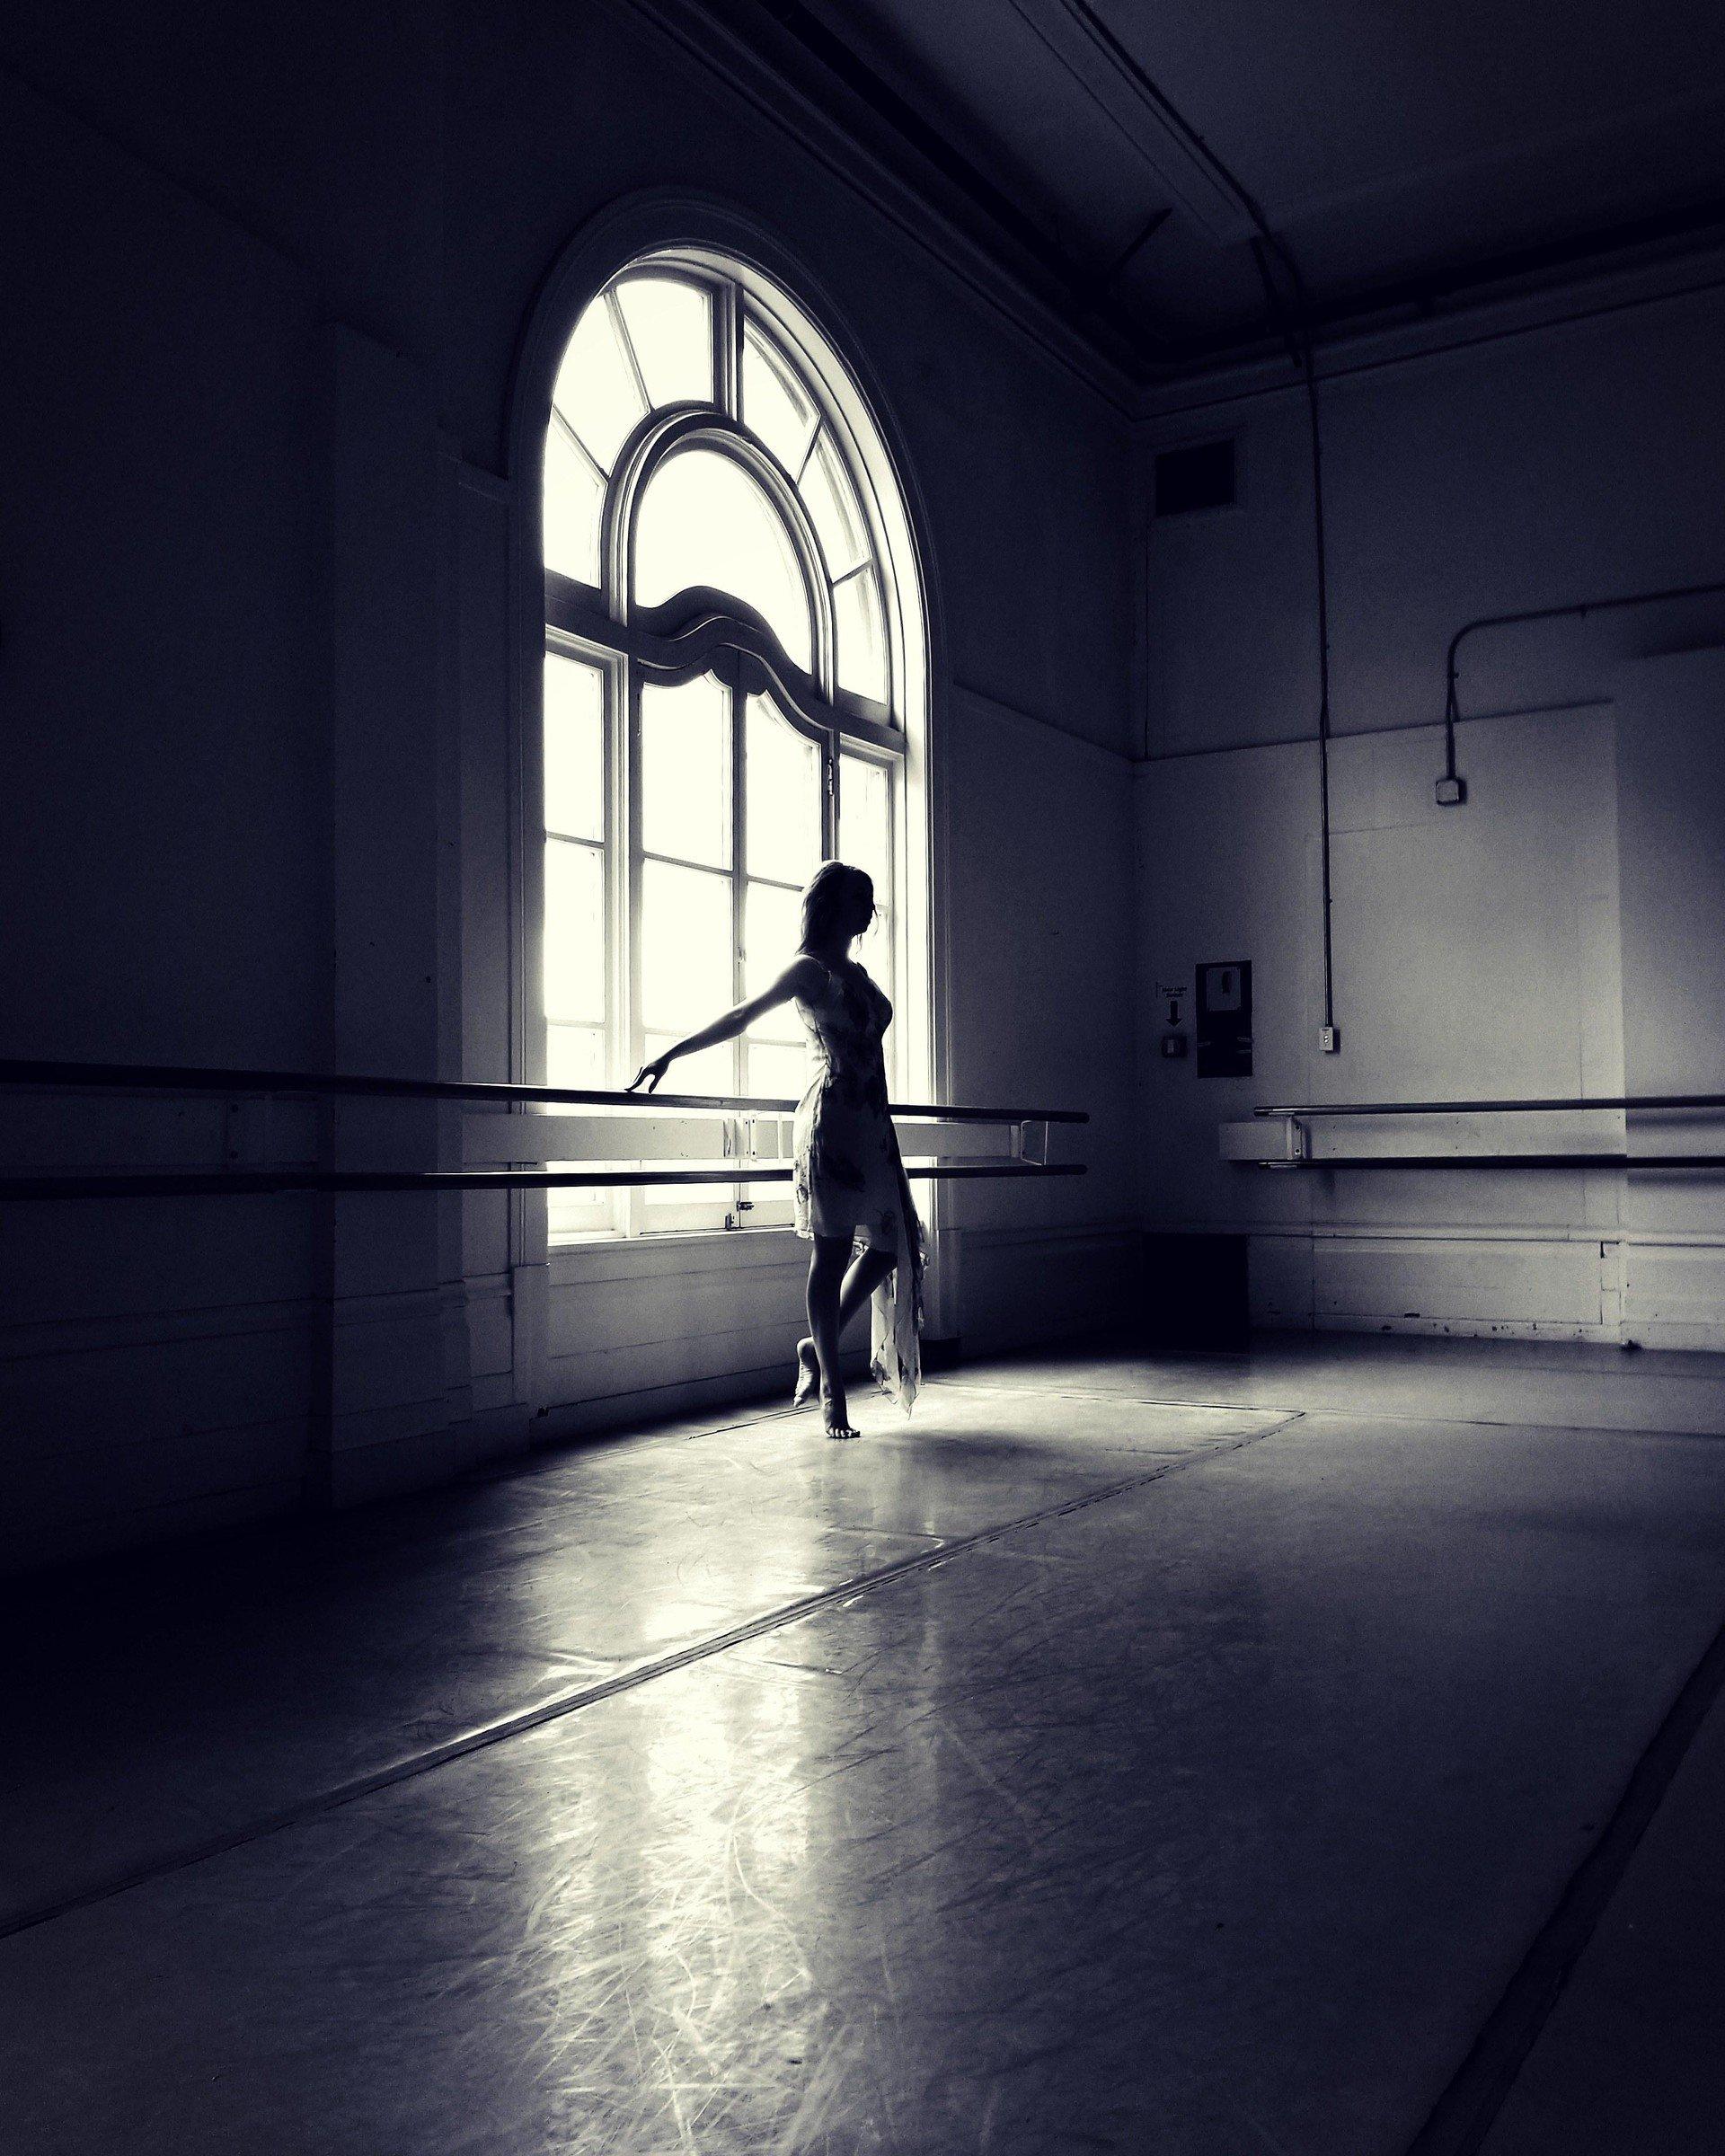 San Francisco workshop spaces Lieu Atypique Alonzo Kings LINES Ballet Studio 1 image 1